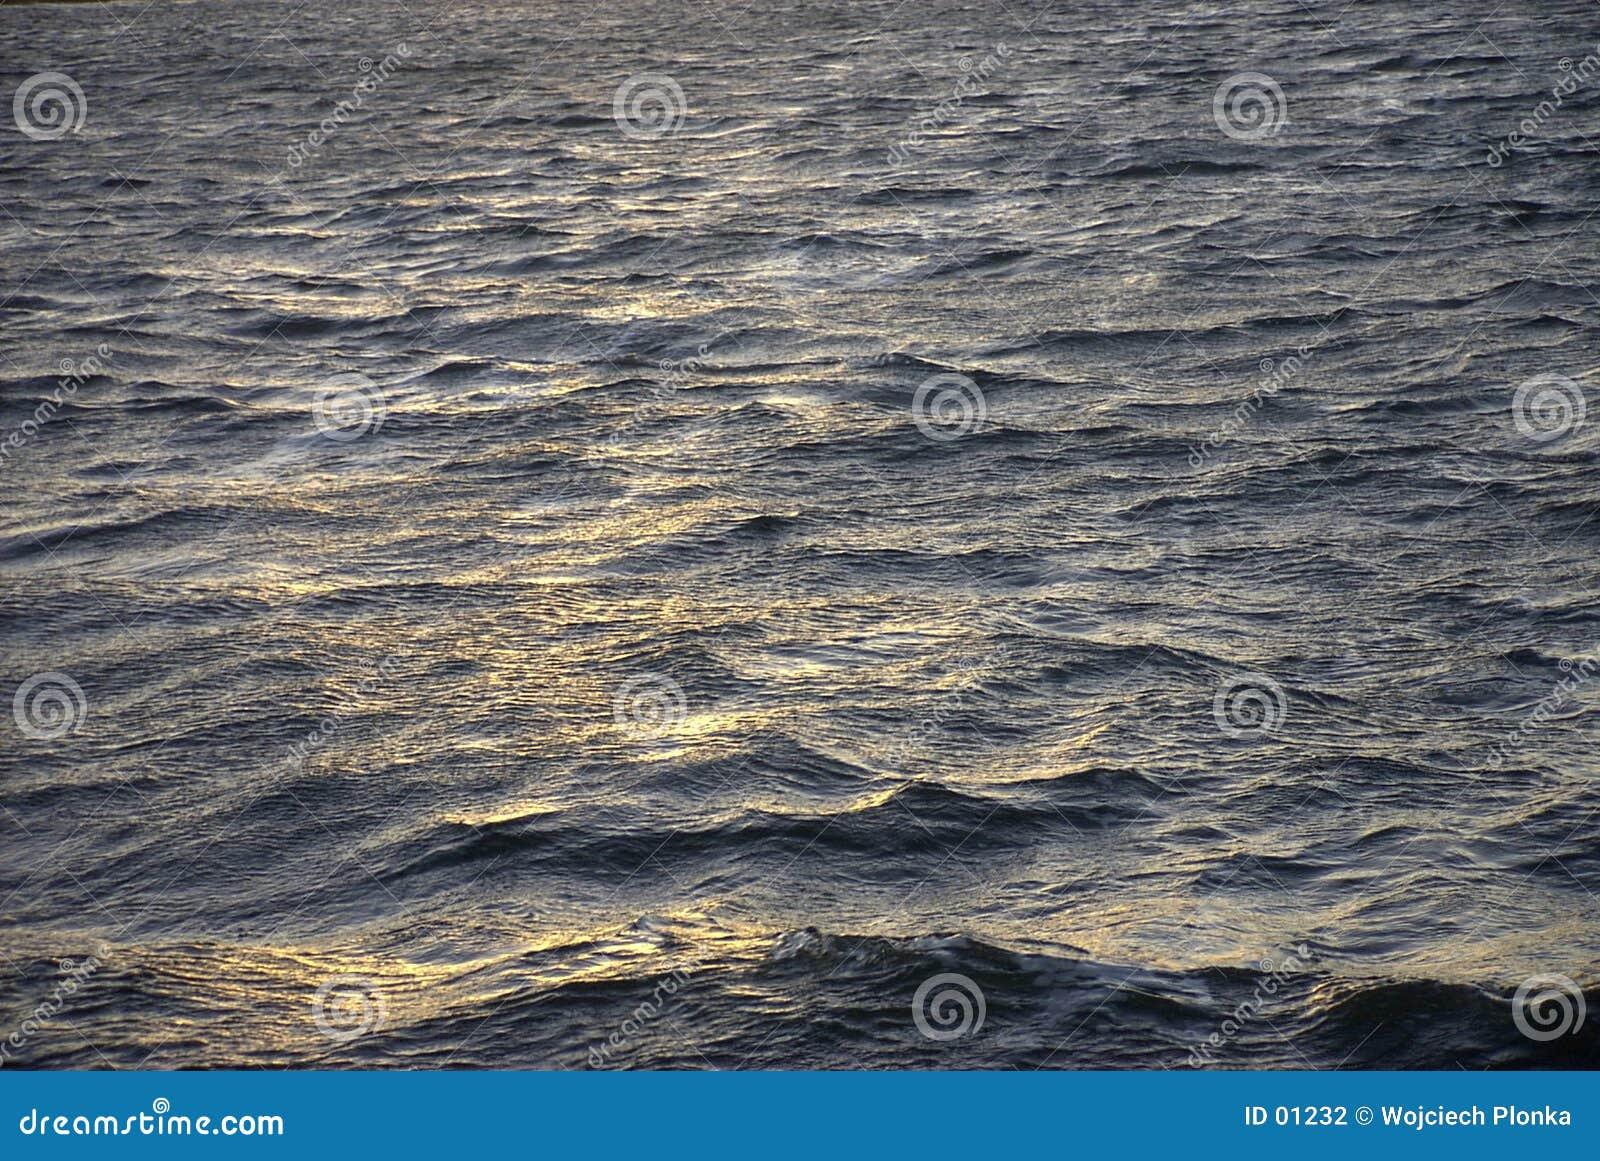 Water waves